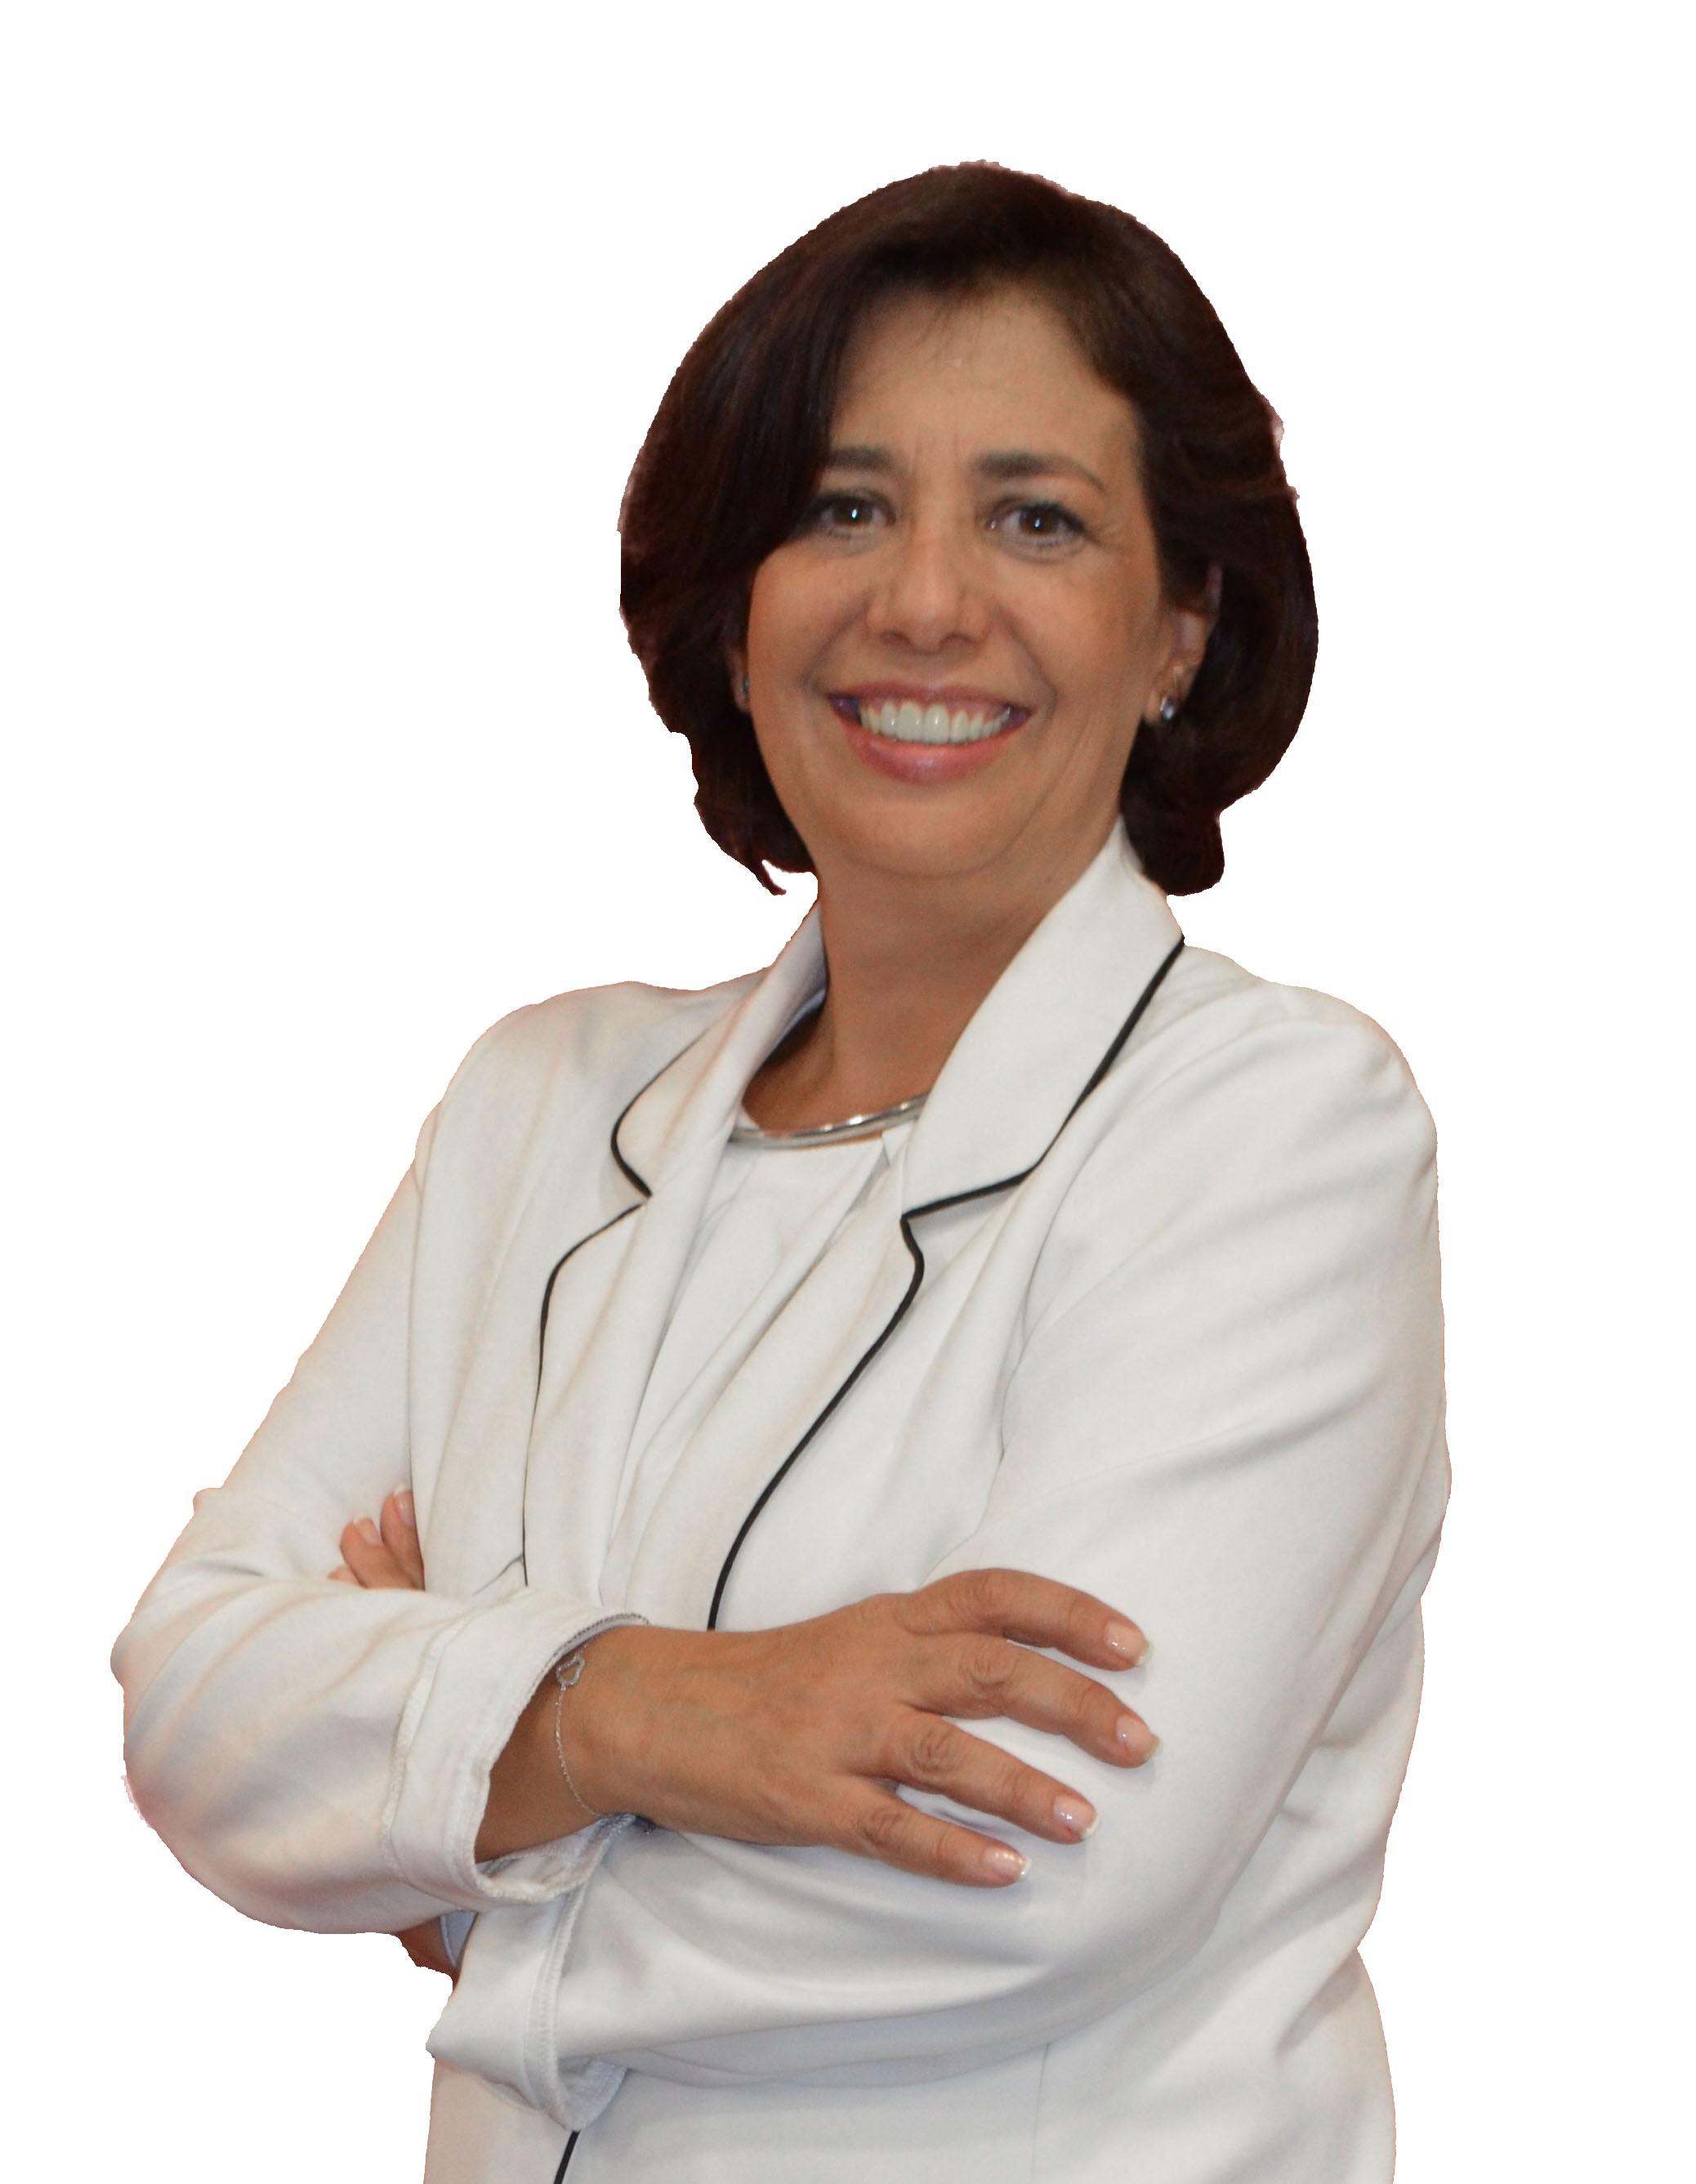 Ana Isabel Lasso Rey